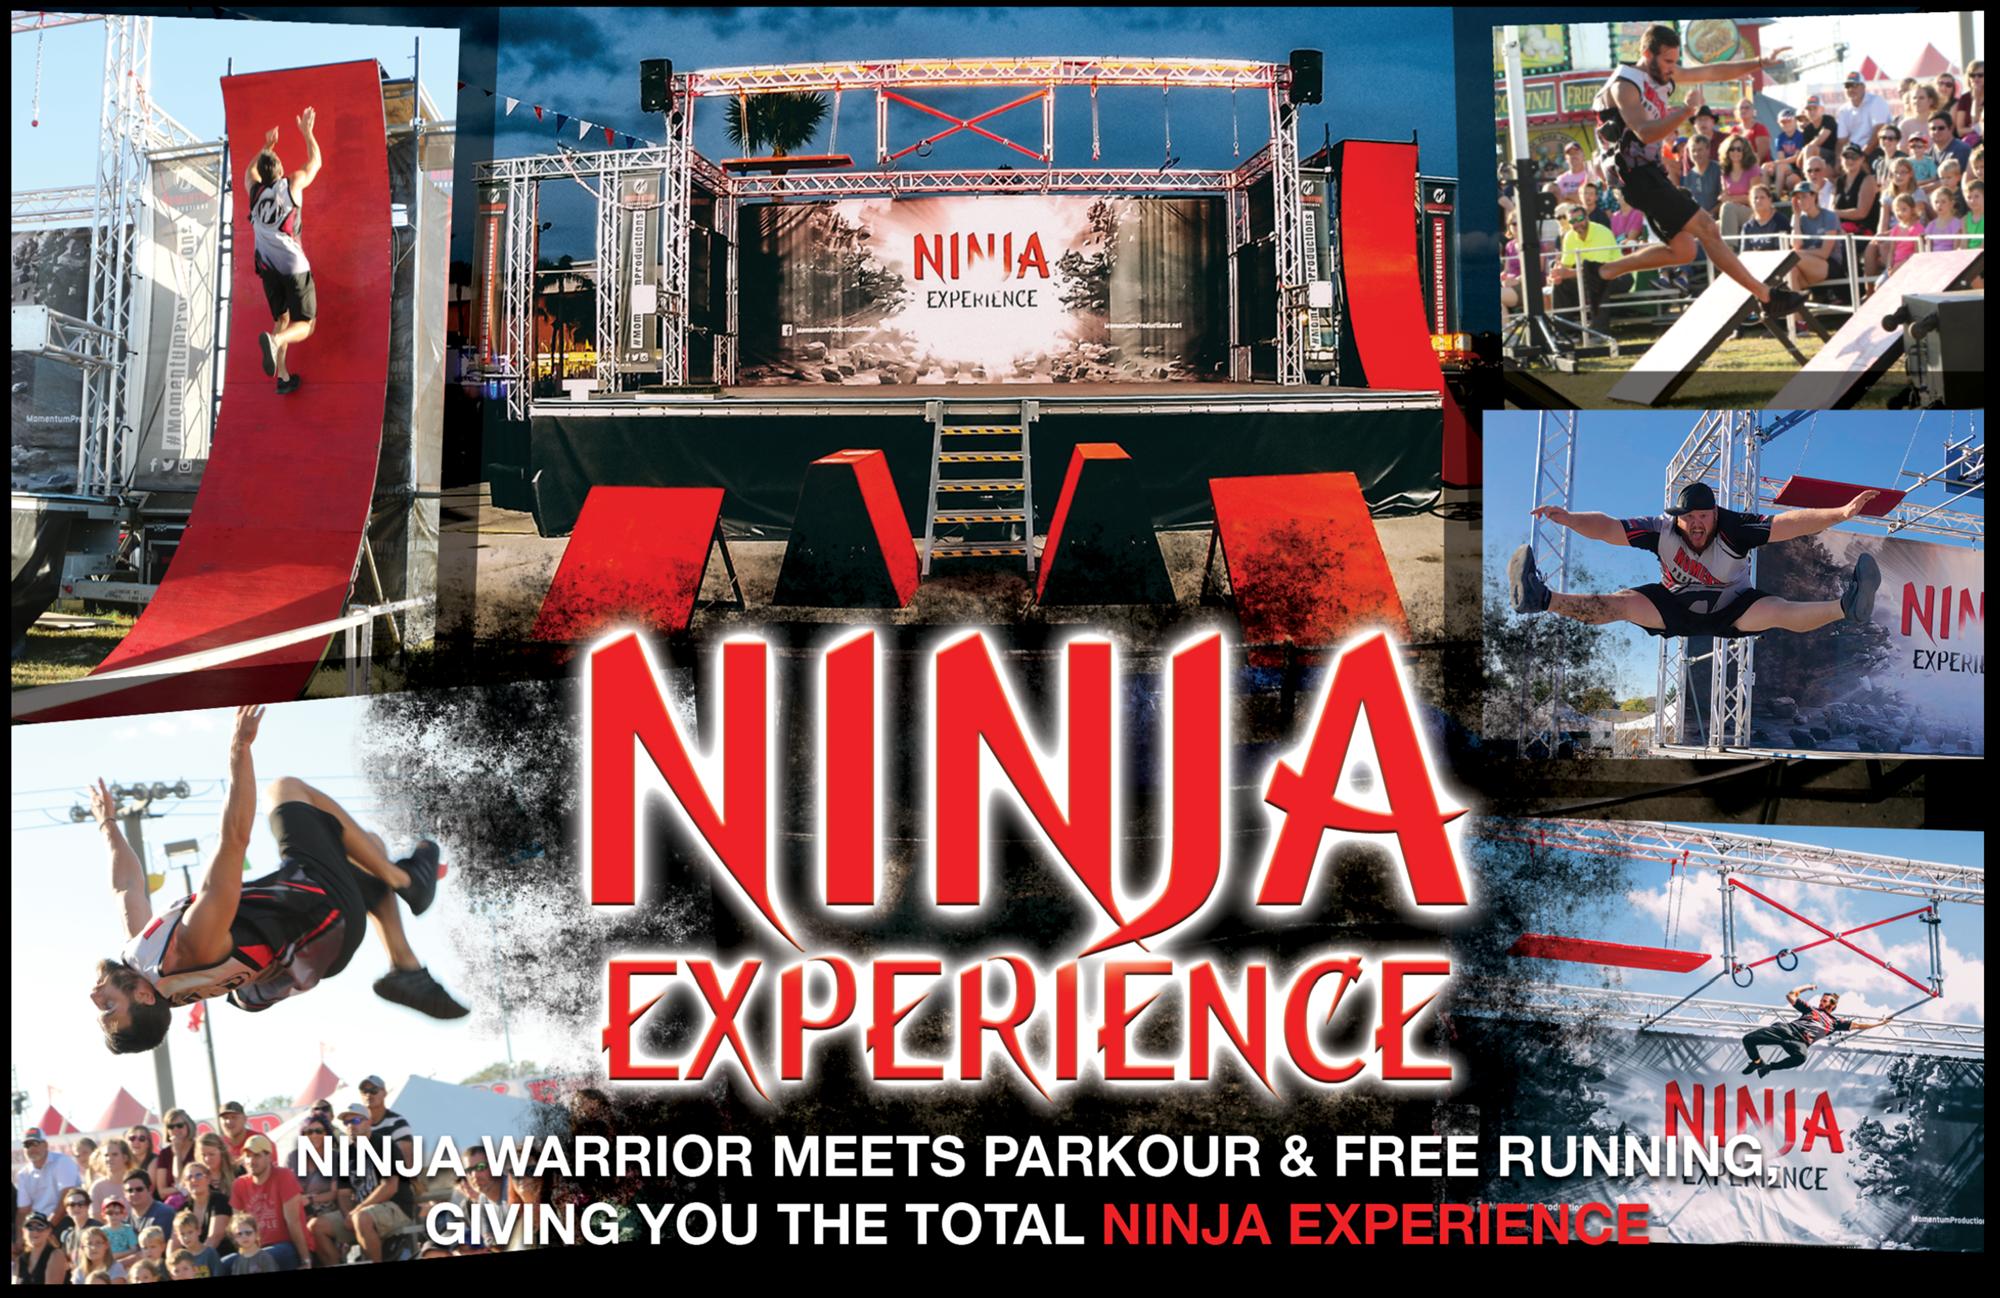 Ninja Experience Show